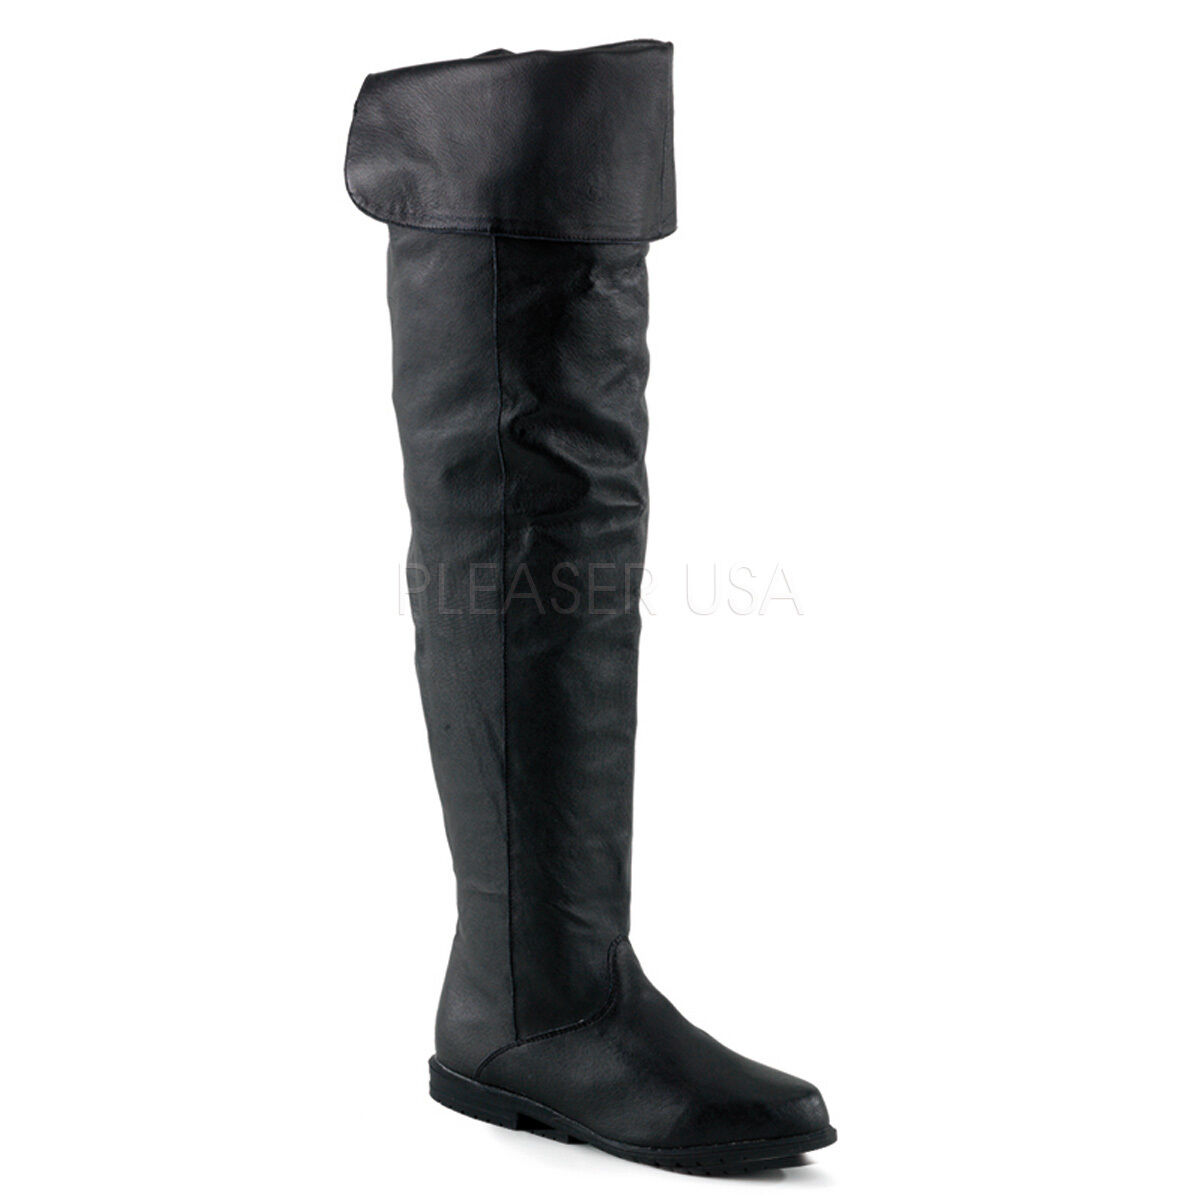 Renaissance Pirate Leather Halloween Women's Costume Thigh Boots RAV8826 B LE